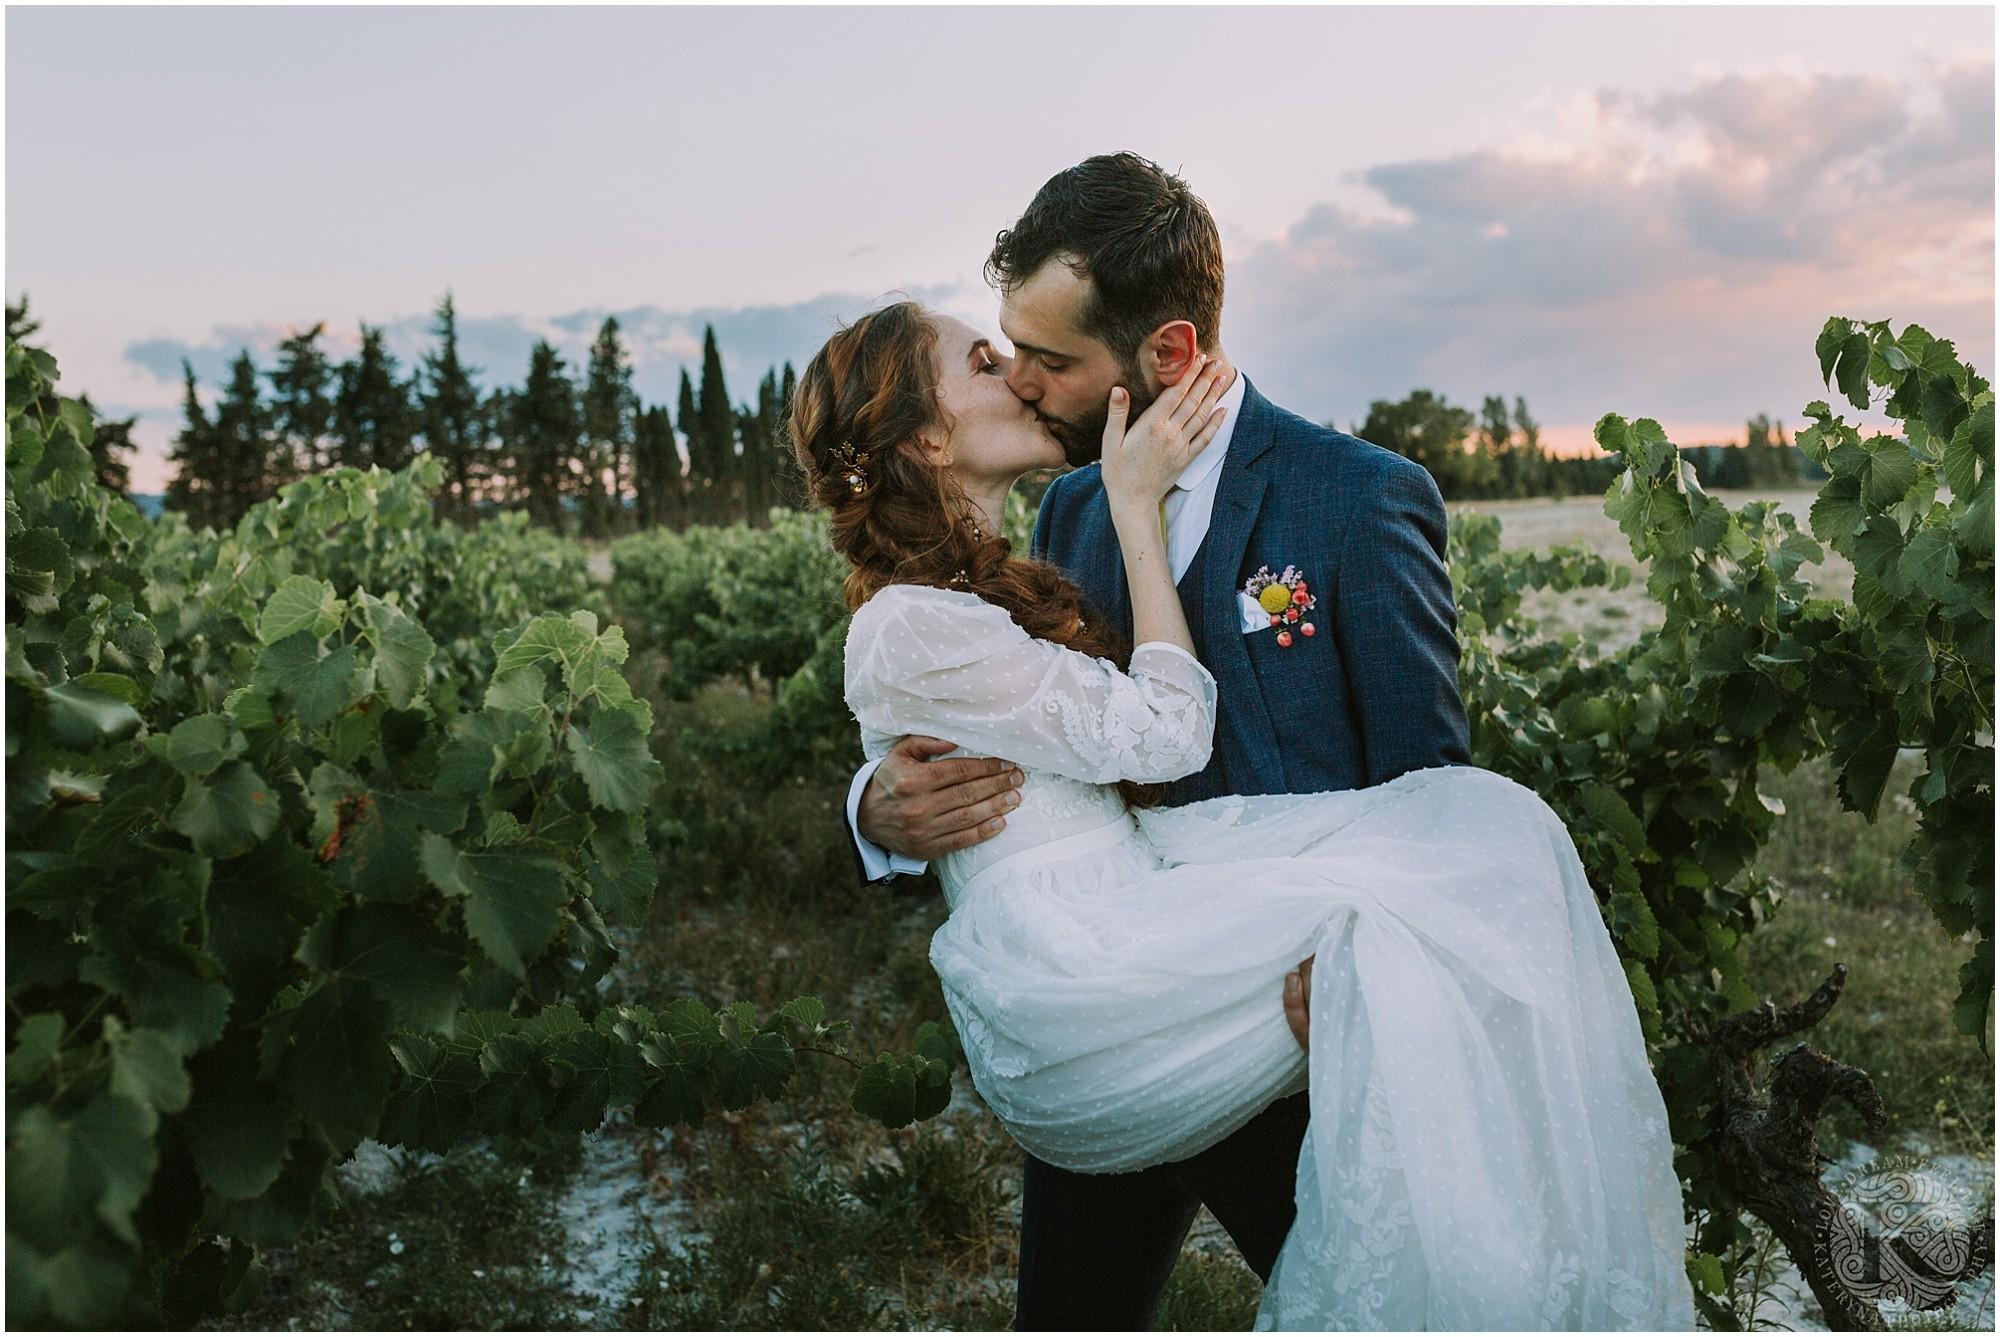 Kateryna-photos-photographe-mariage-vaucluse-provence-avignon-ferme-st-hugues_0076.jpg